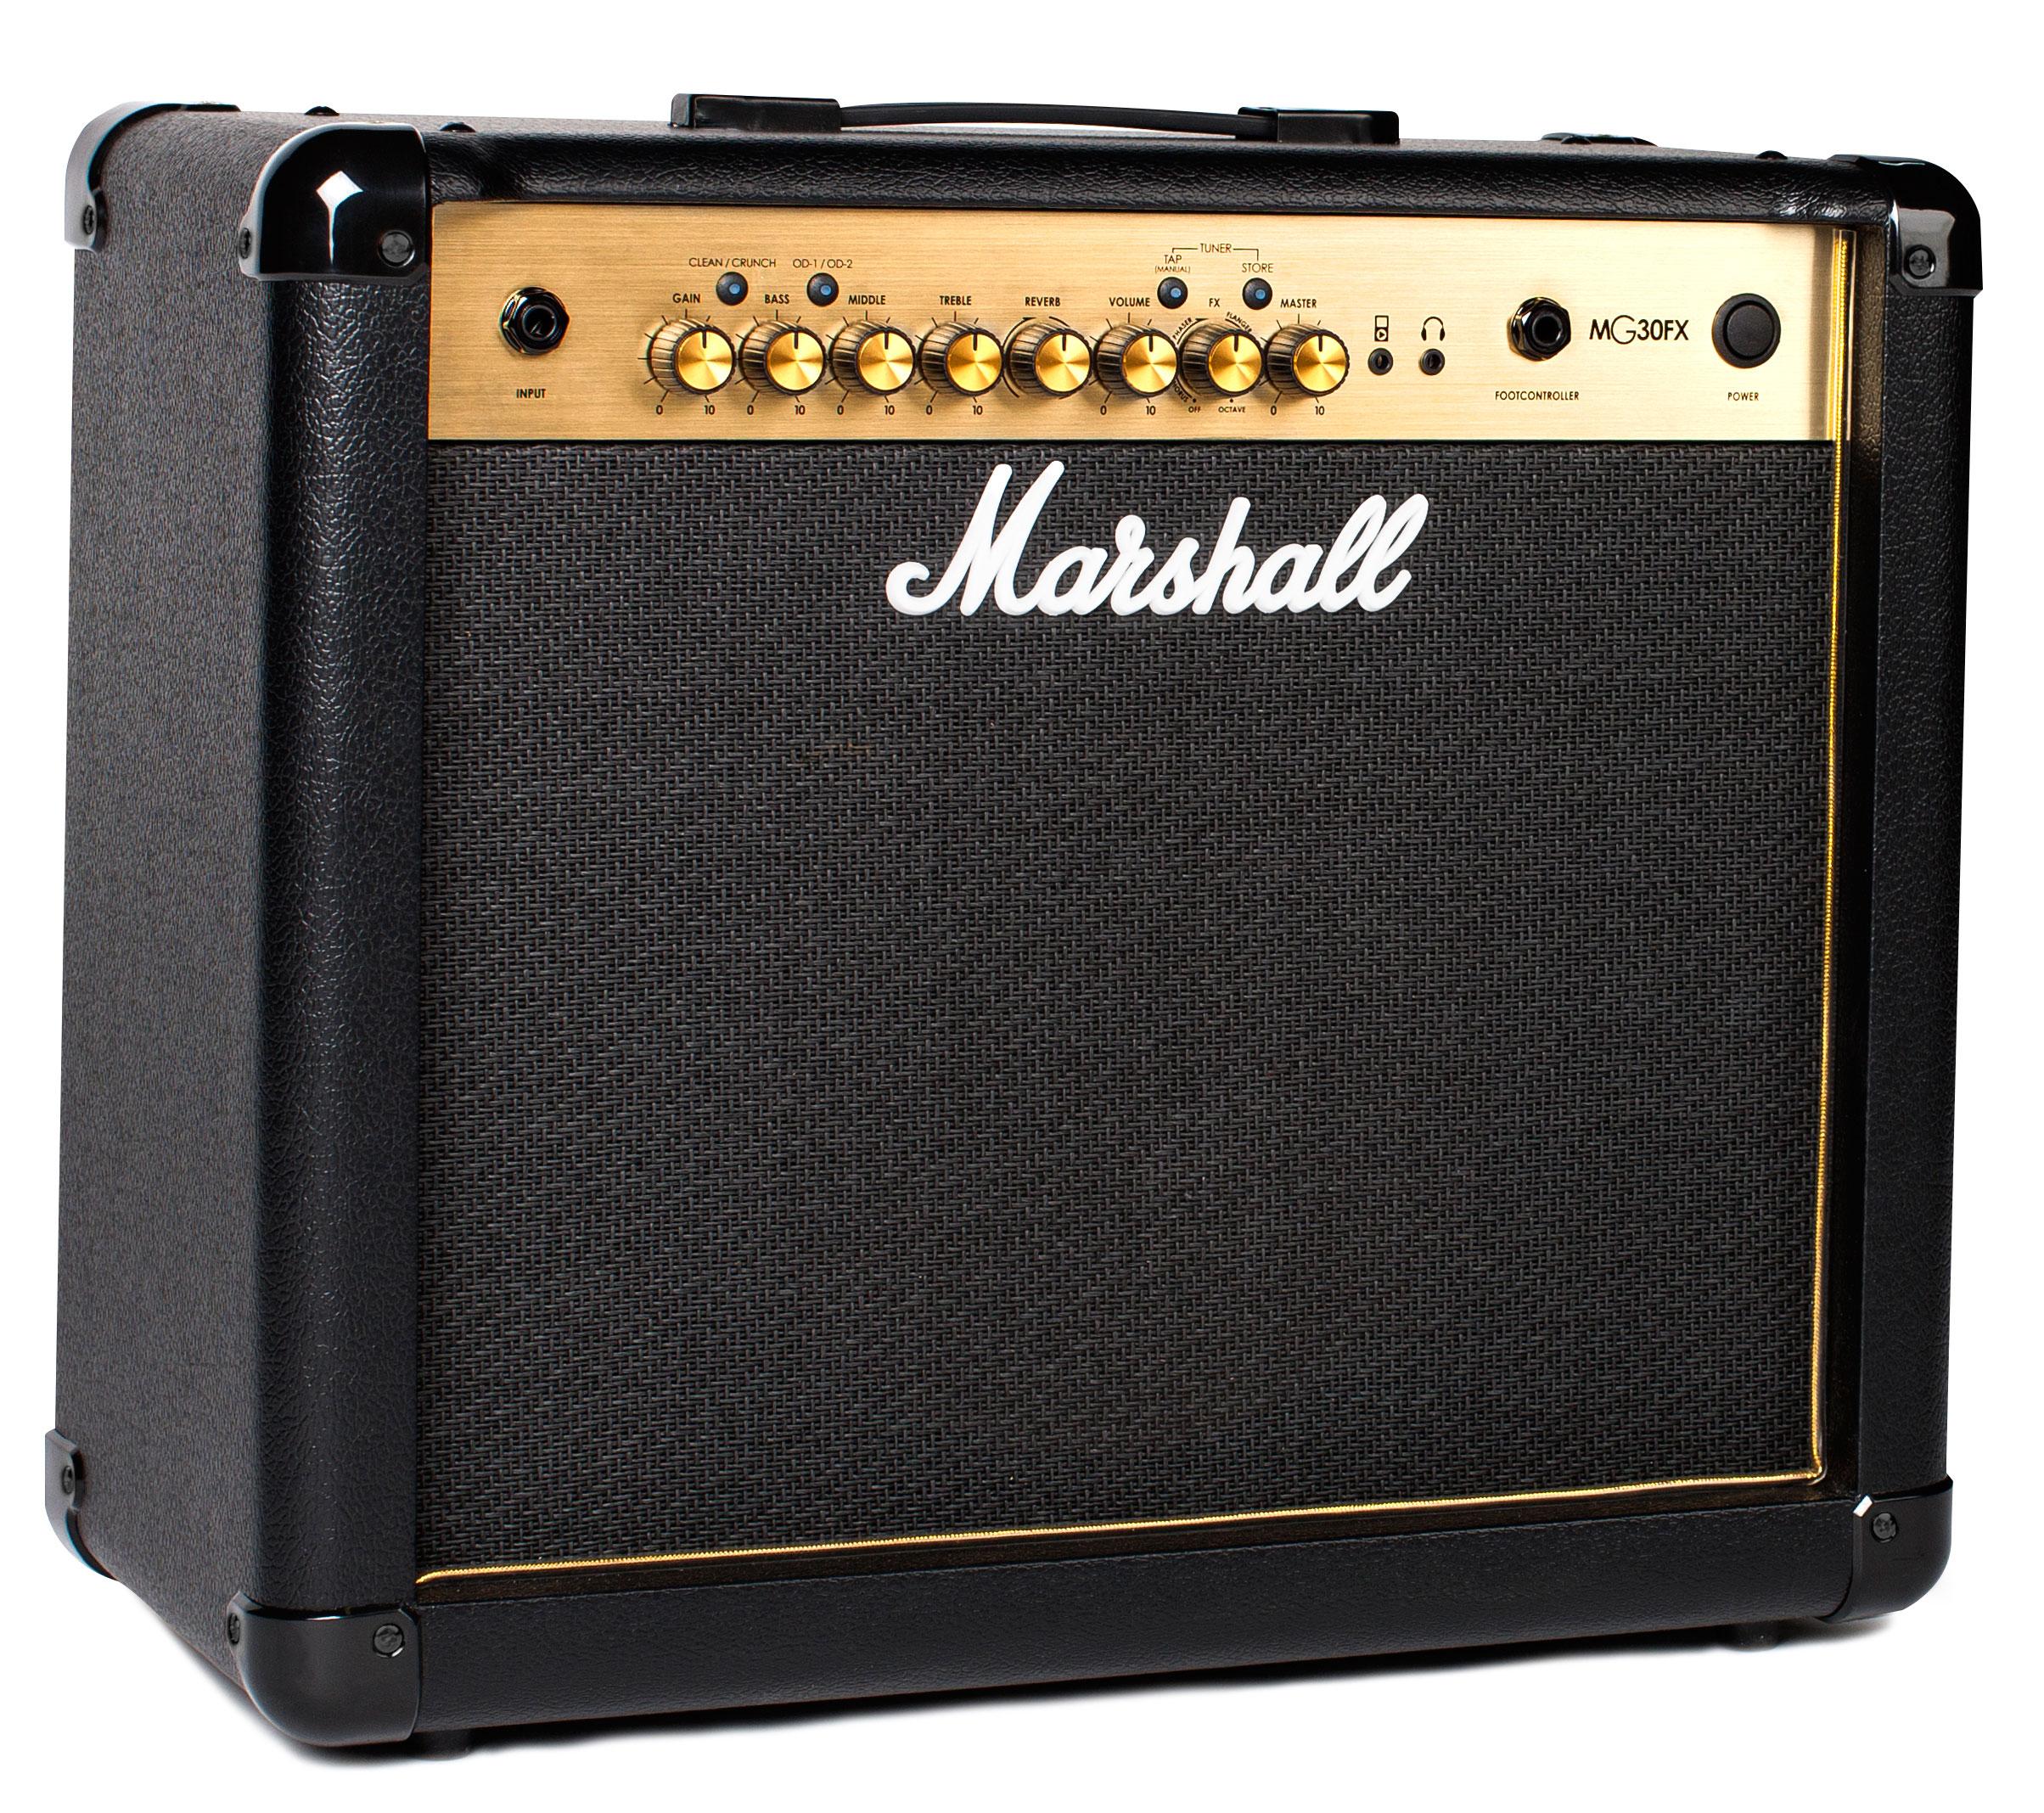 Marshall M-MG30GFX-U